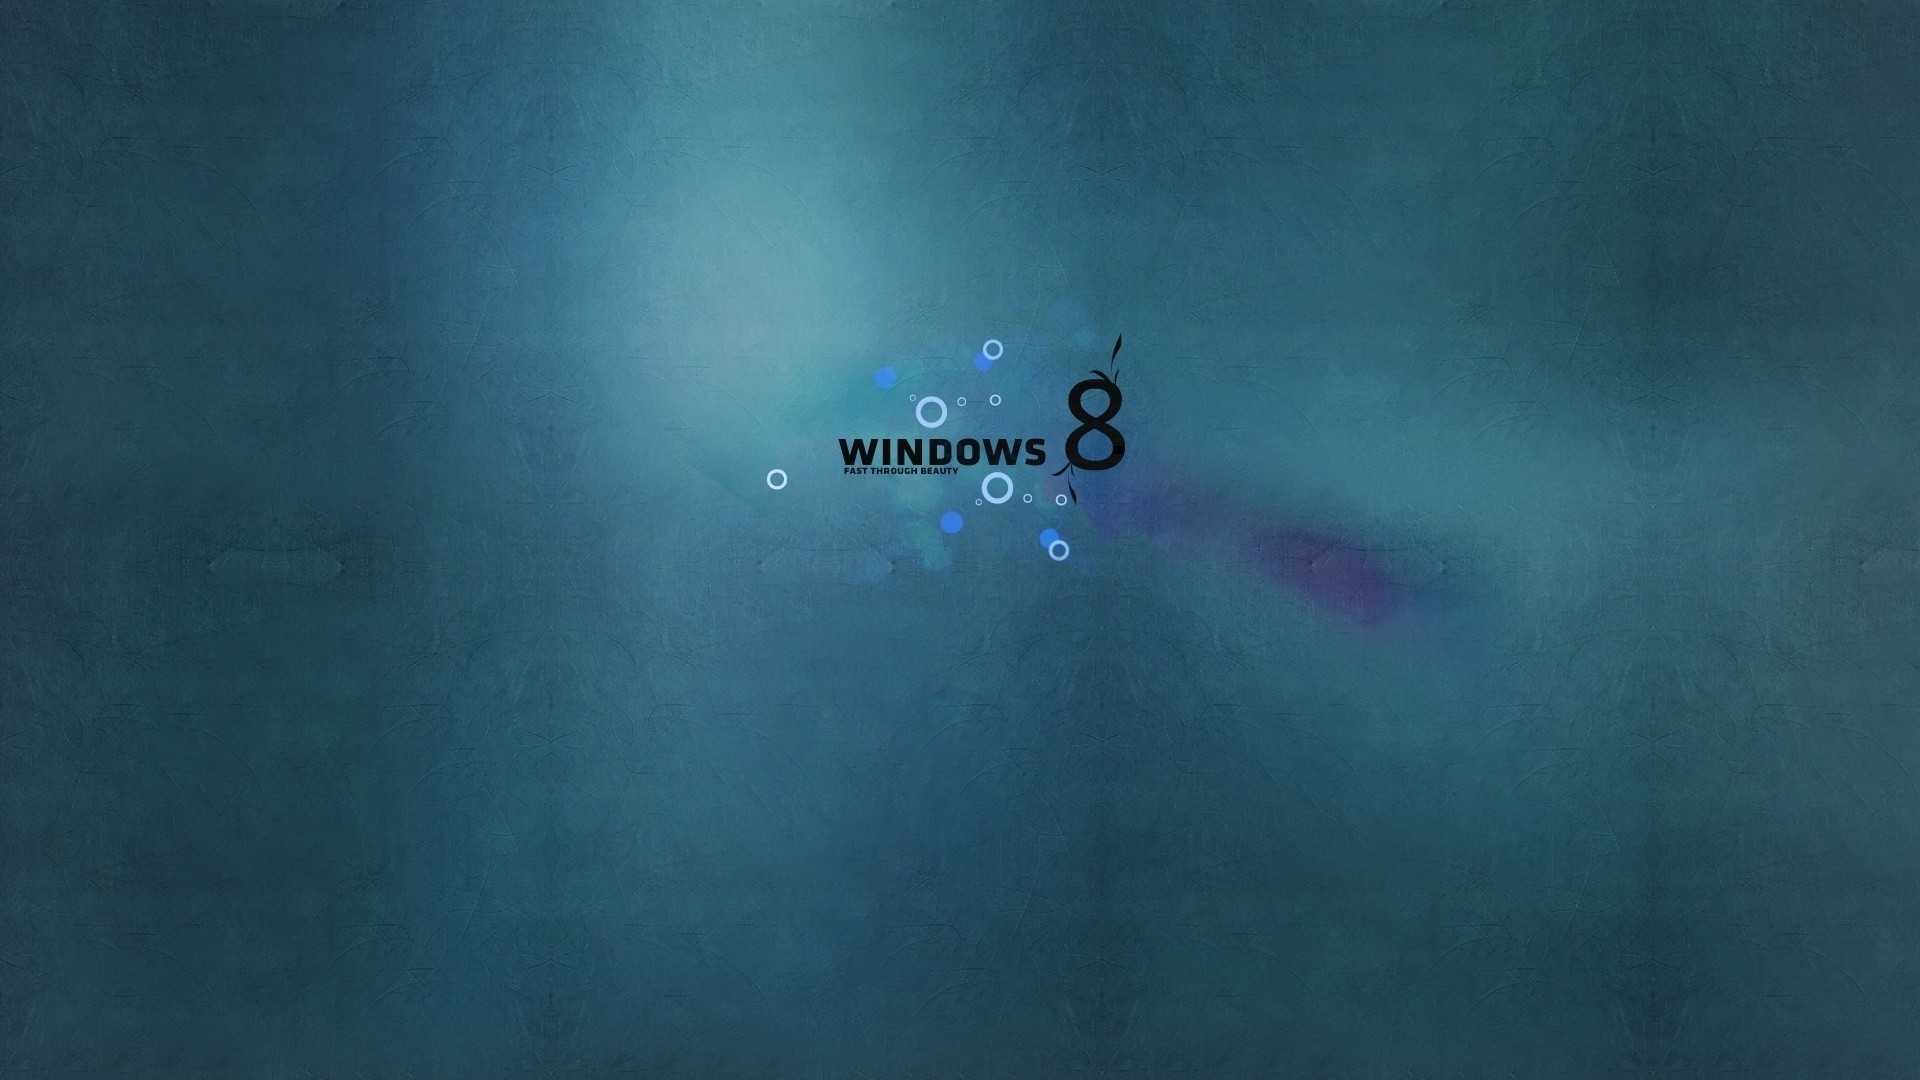 Windows HD desktop wallpaper : Widescreen : Fullscreen : Mobile 1440×900  Windows 8 Black